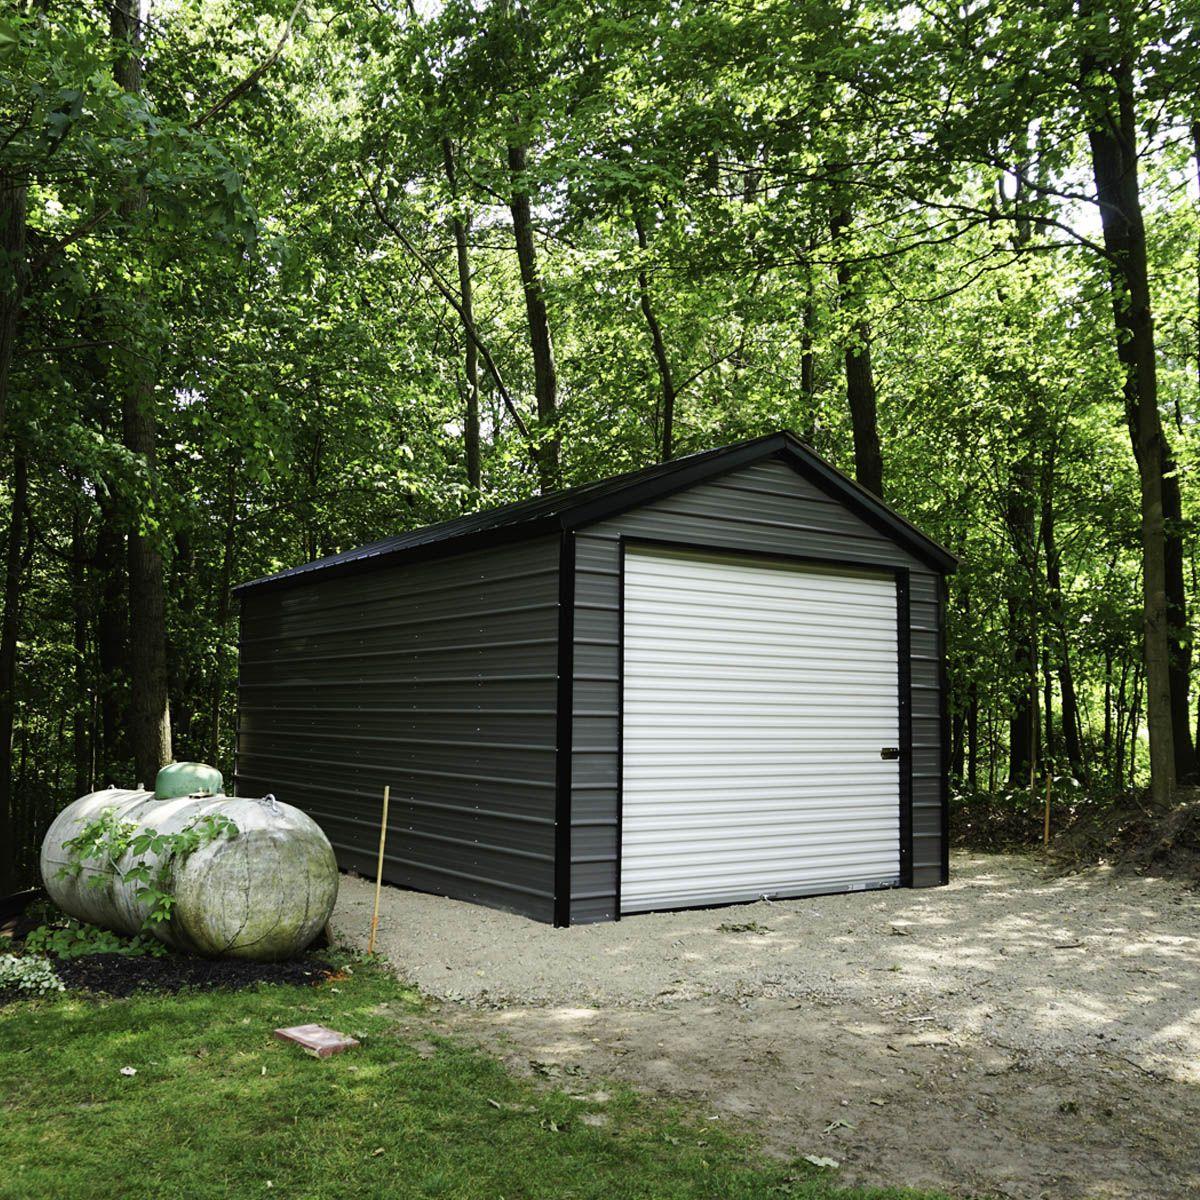 Products - Metal Carports, Garages, Barns, Workshops for ...